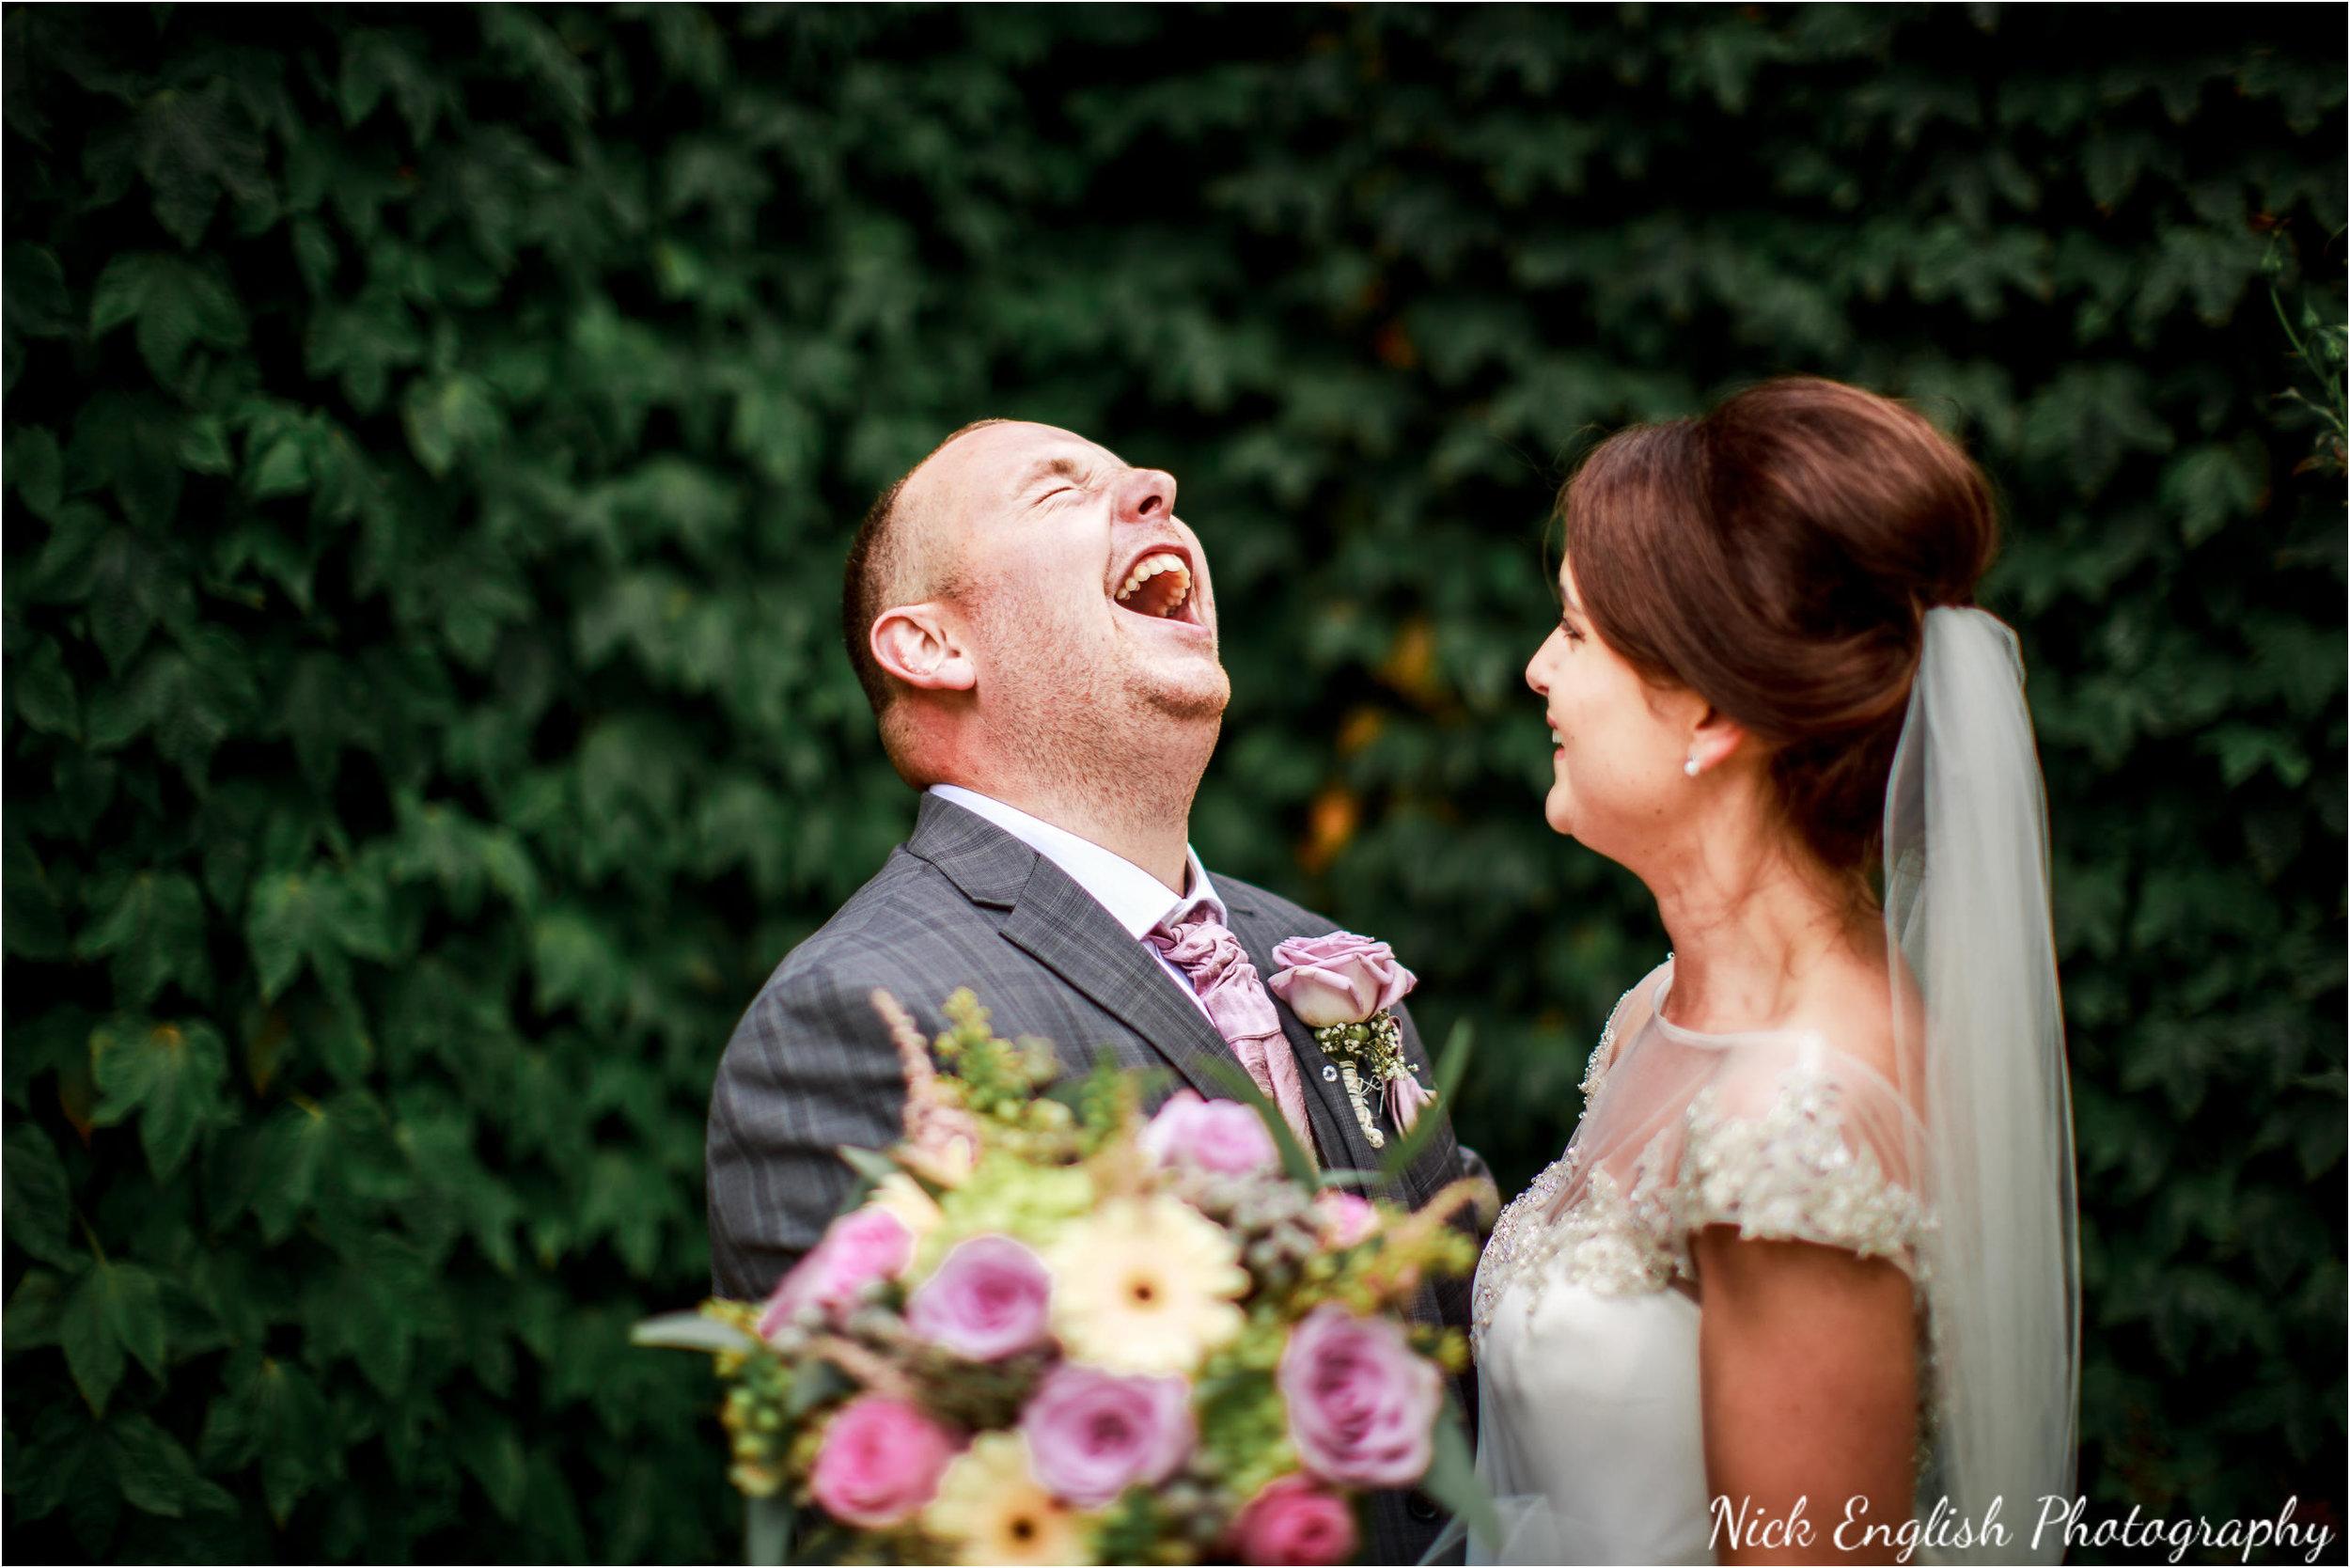 Stacey-Ash-Wedding-Photographs-Stanley-House-Preston-Lancashire-127.jpg